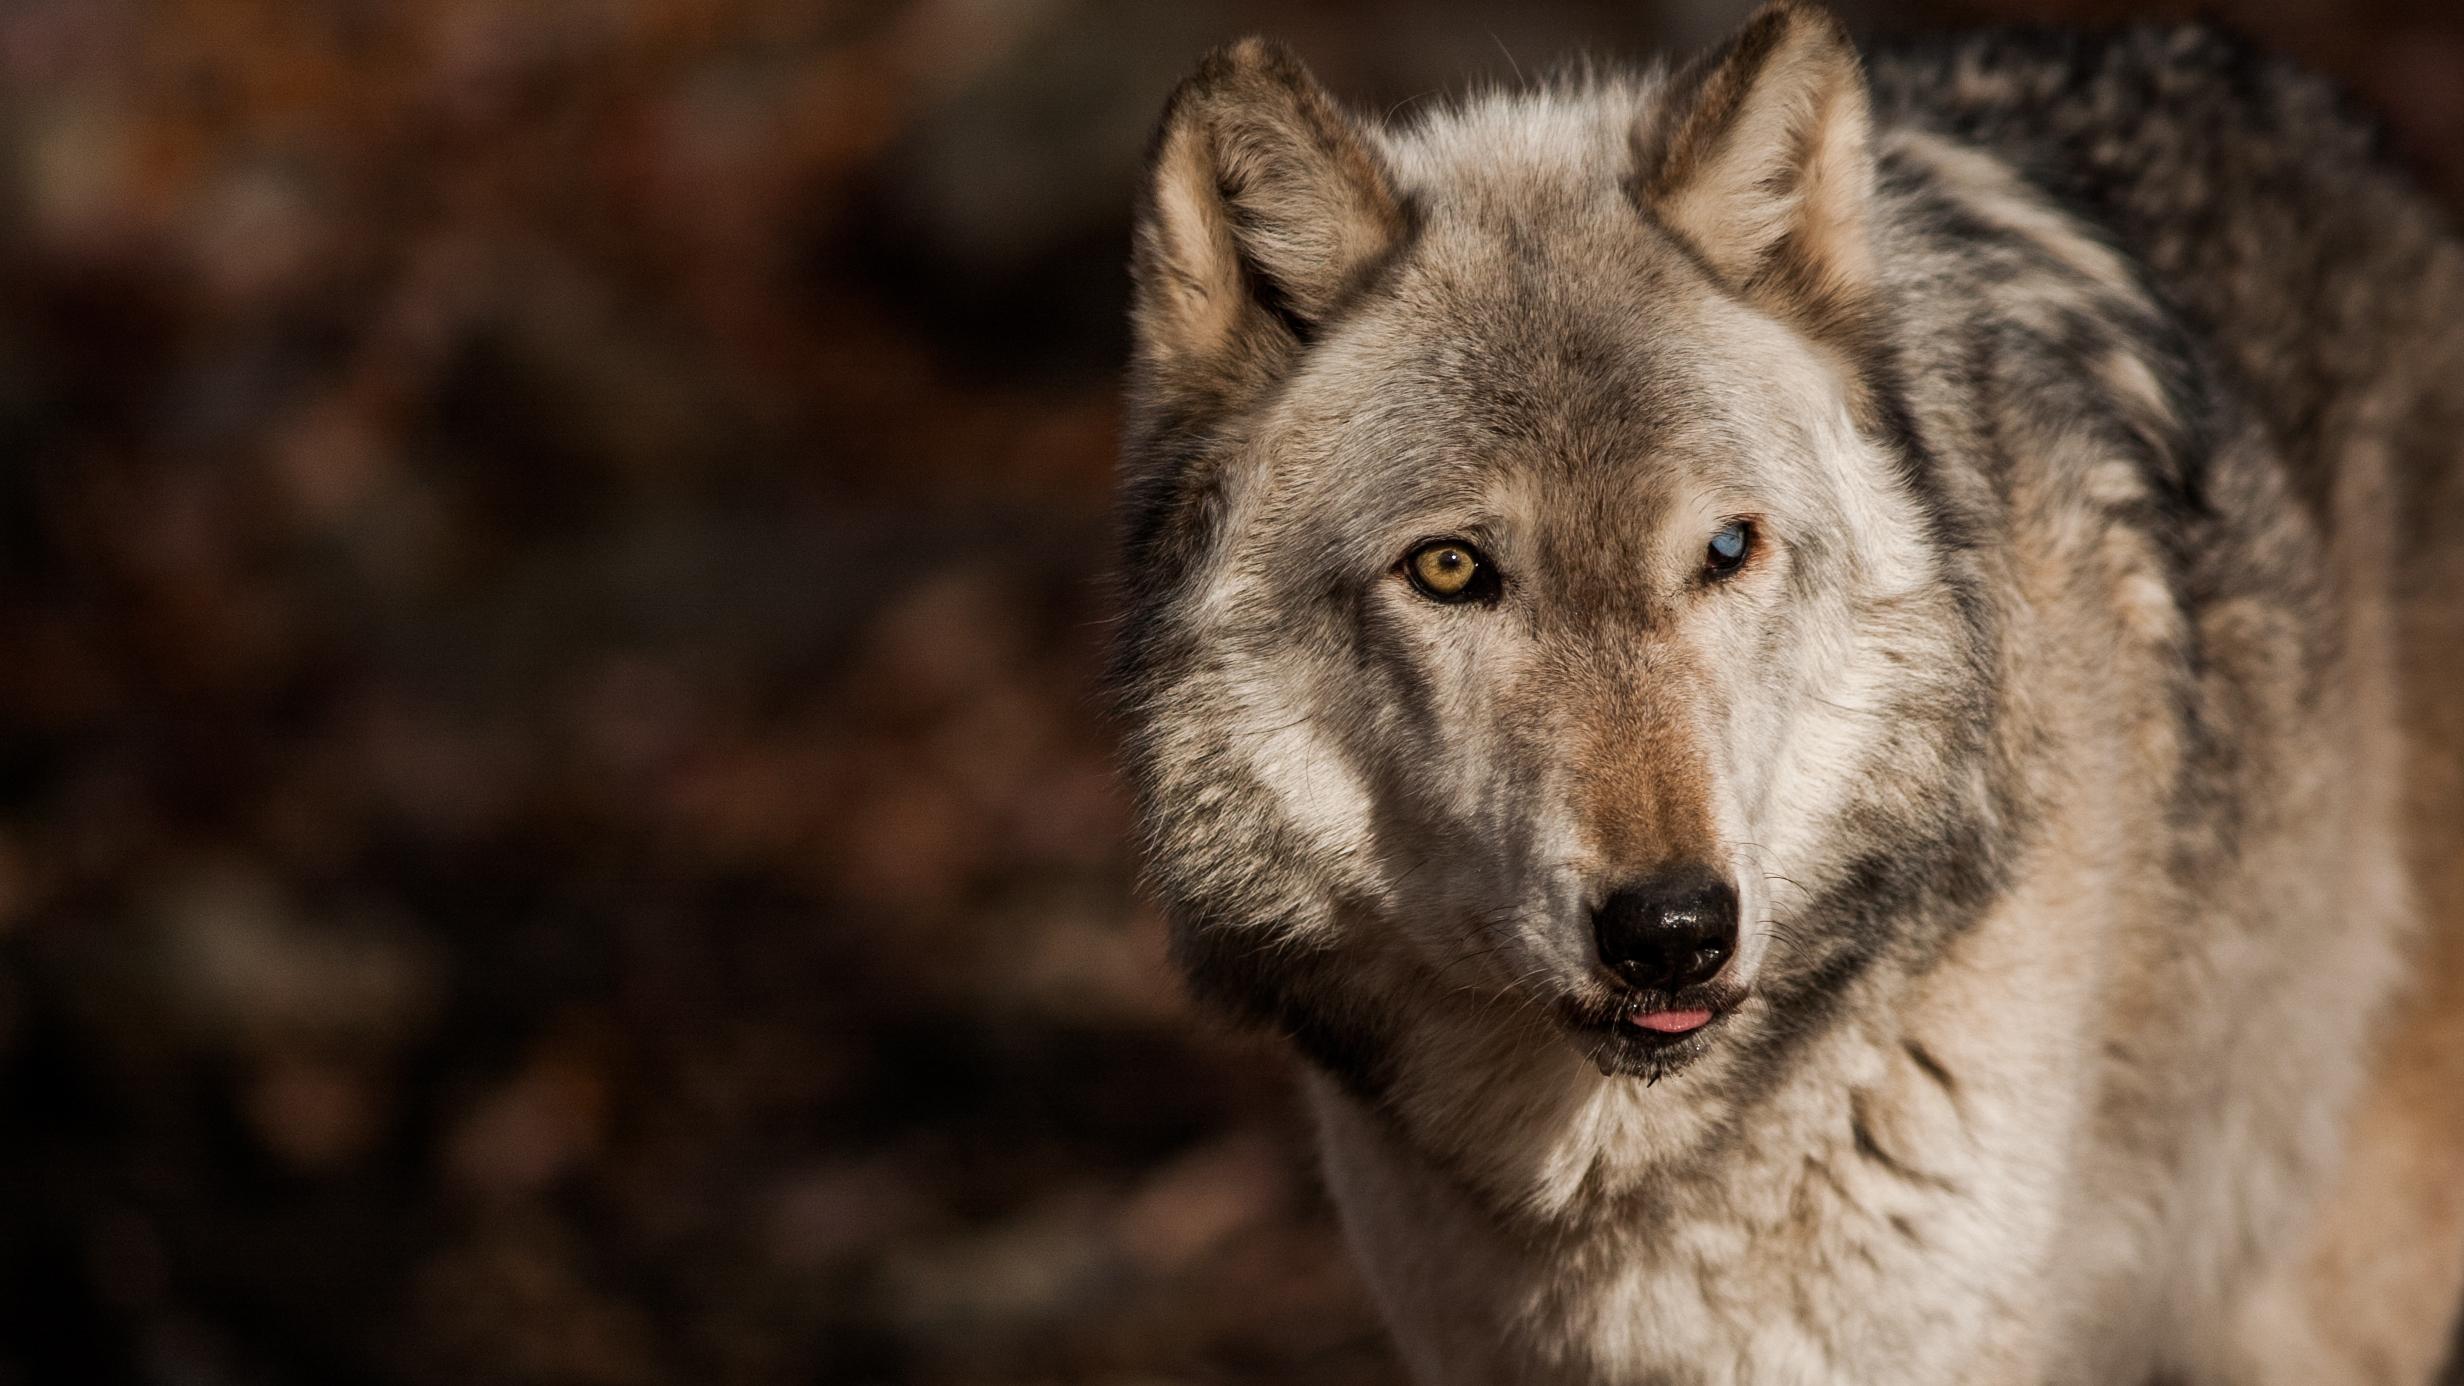 lakotawolf-996.jpg